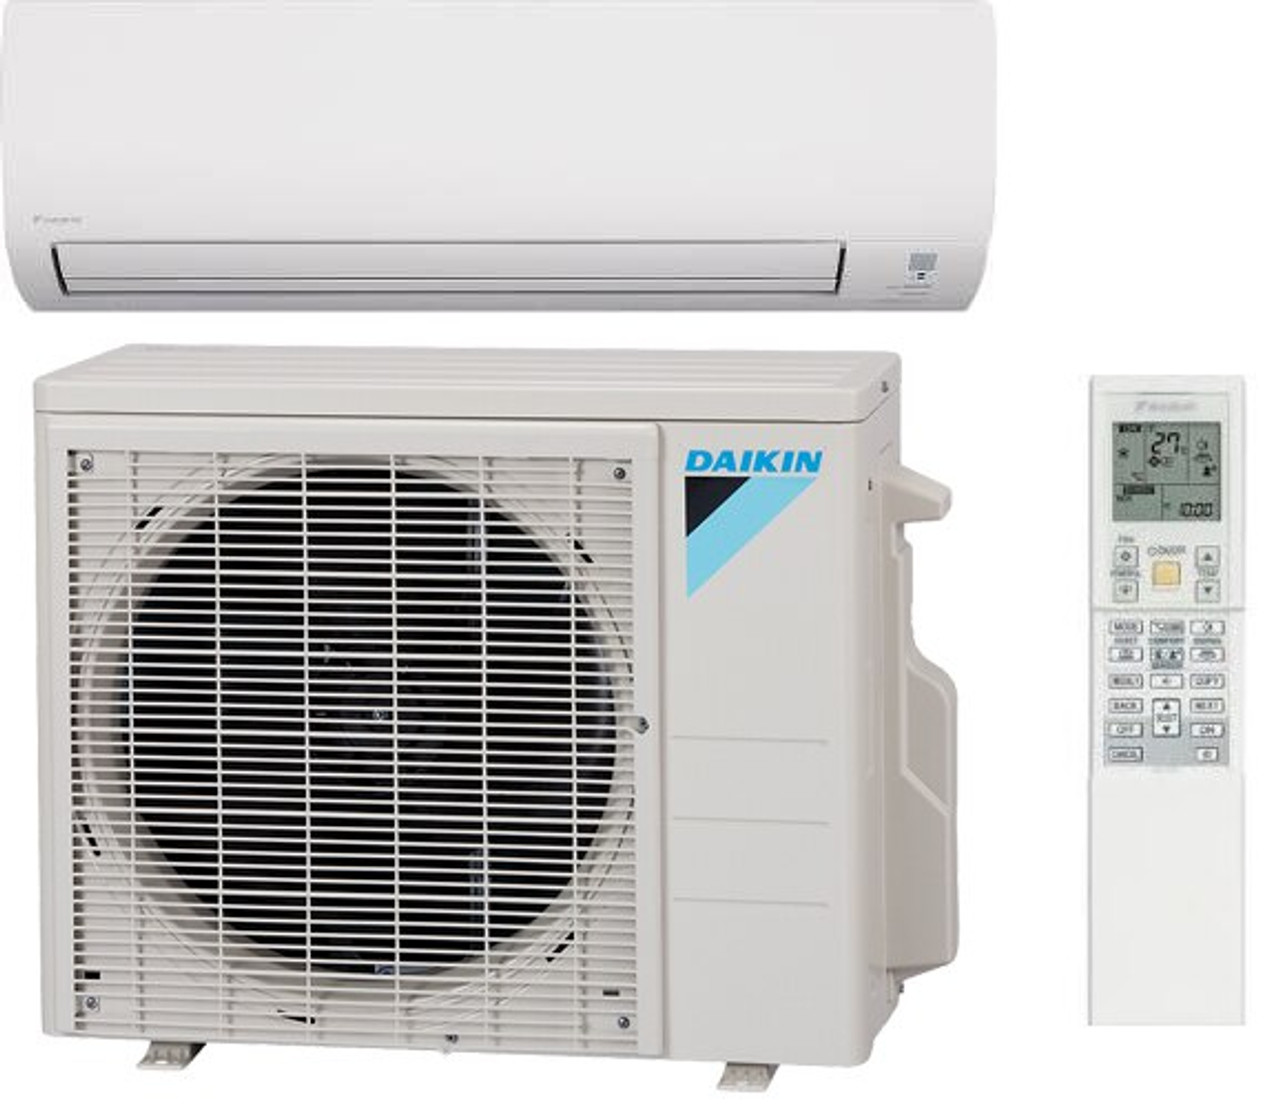 Daikin FTX24NMVJU / RX24NMVJU 19 Series 24000 BTU Class Heat Pump 18 SEER  Single Zone Mini Split Air Conditioner System